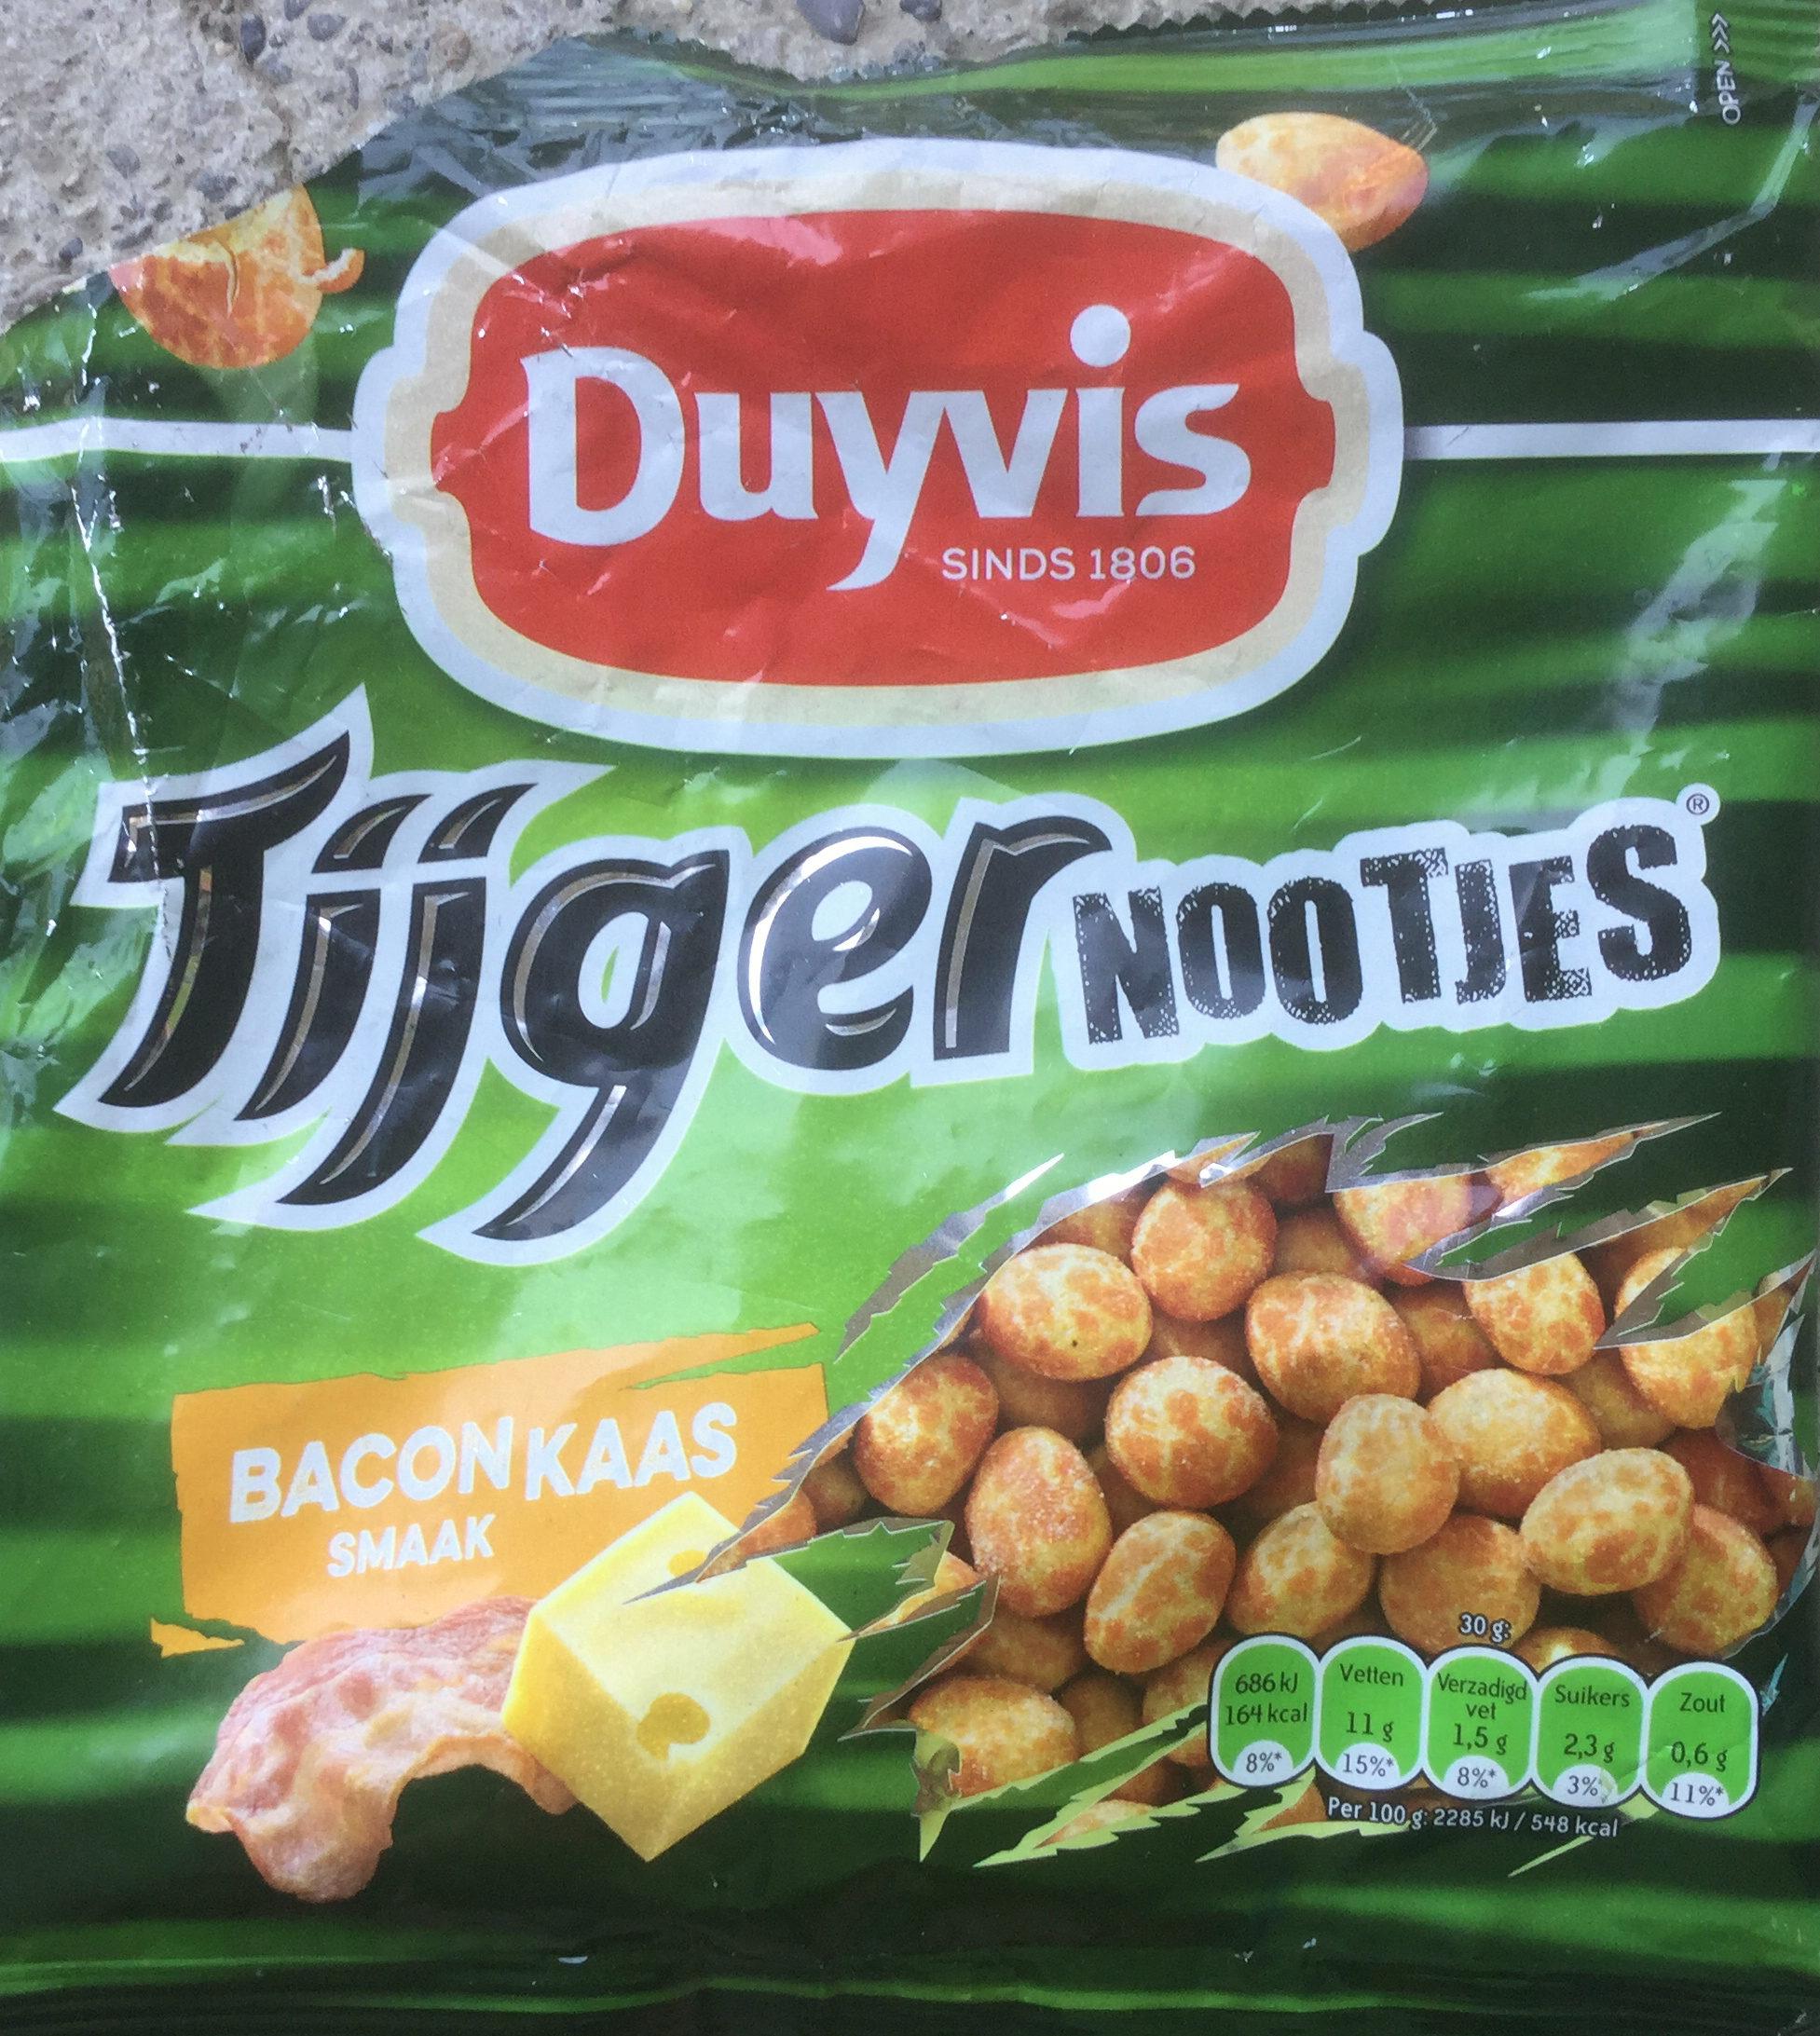 Tijgernootjes bacon kaas smaak - Product - nl